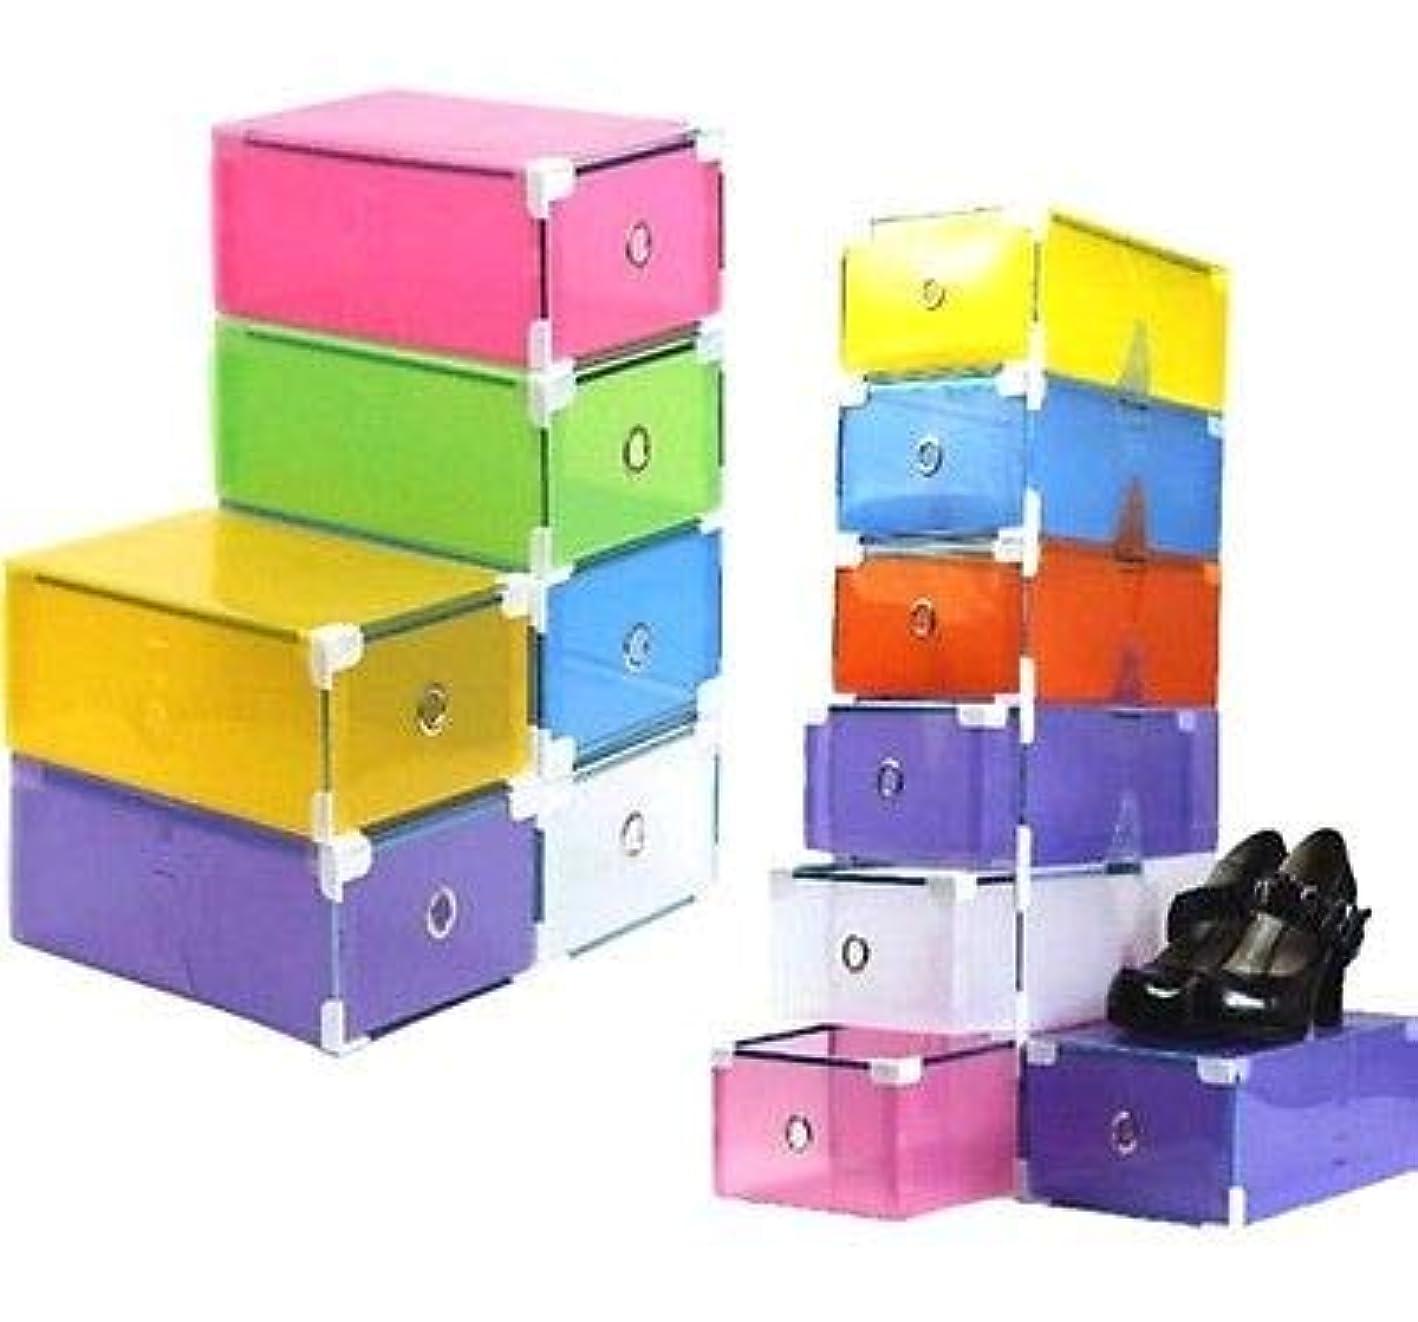 FidgetGear FD544 Drawer Container Women Foldable Shoe Organizer Storage Box Stackable 1PC Yellow 1pc